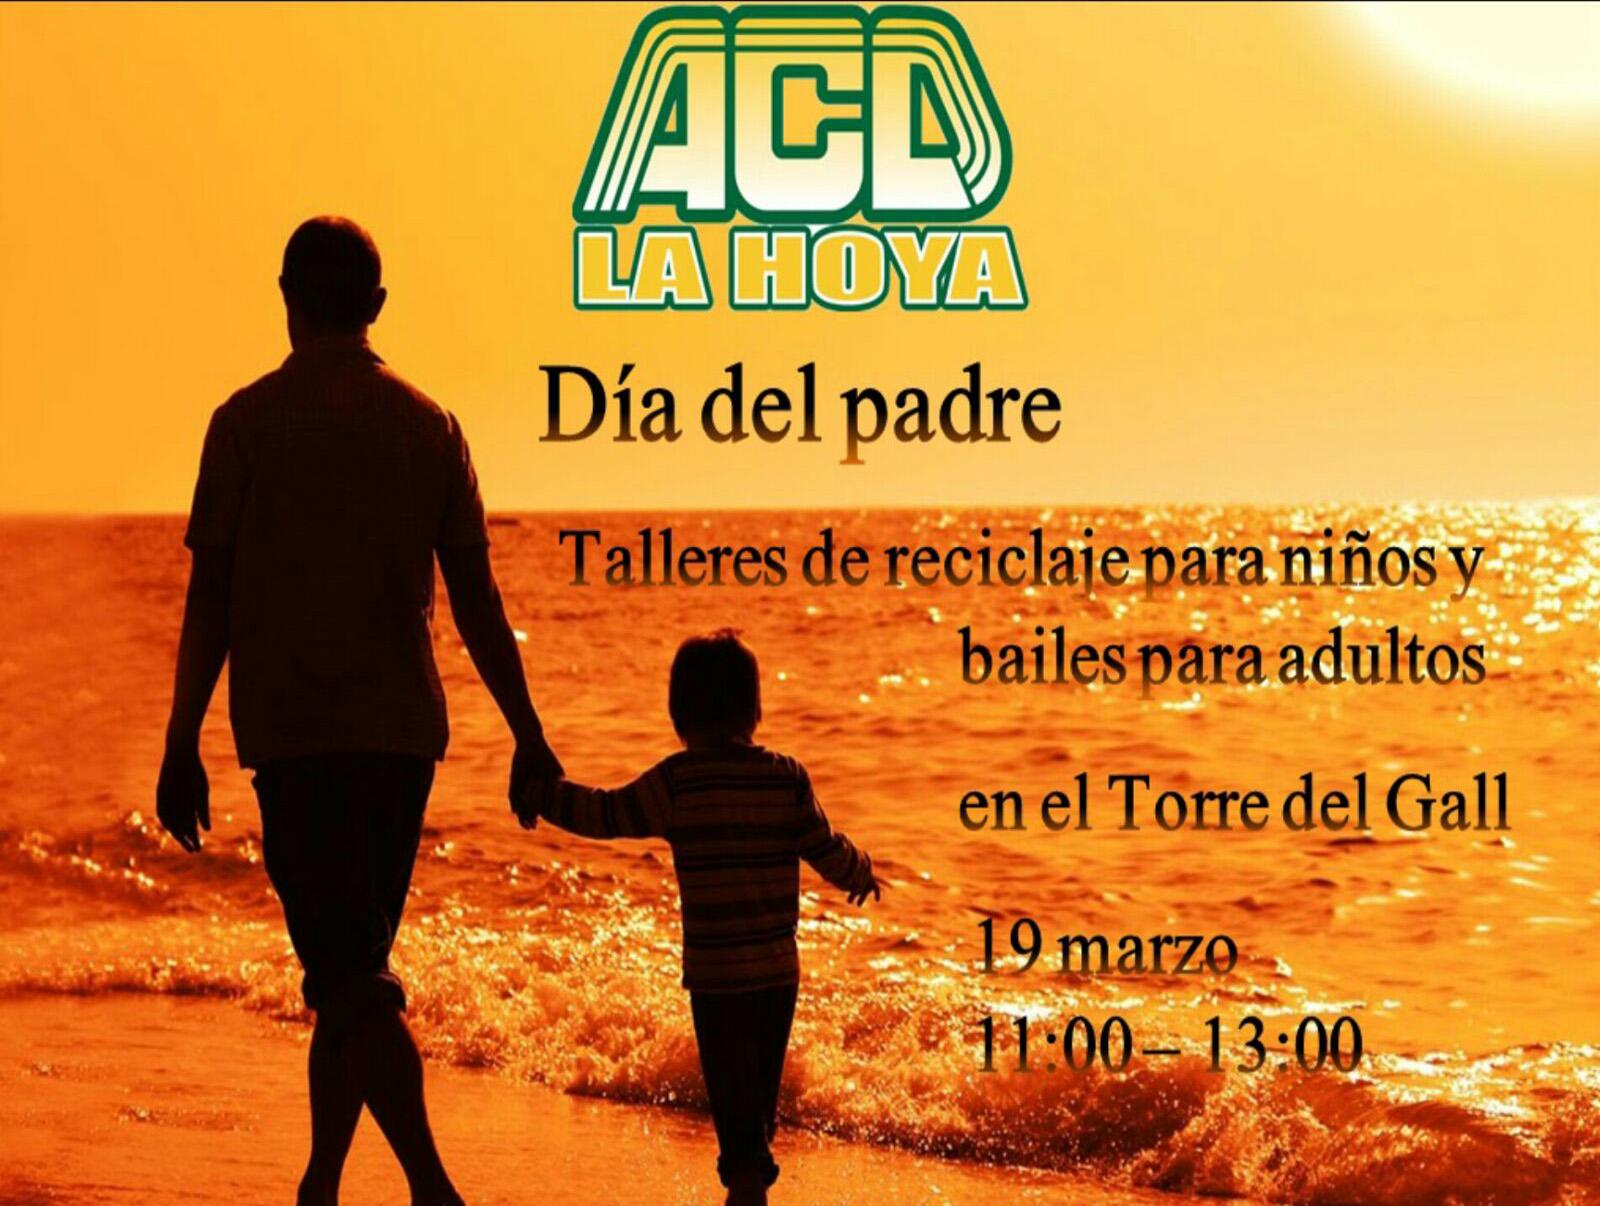 Dia del Padre ACD LA HOYA